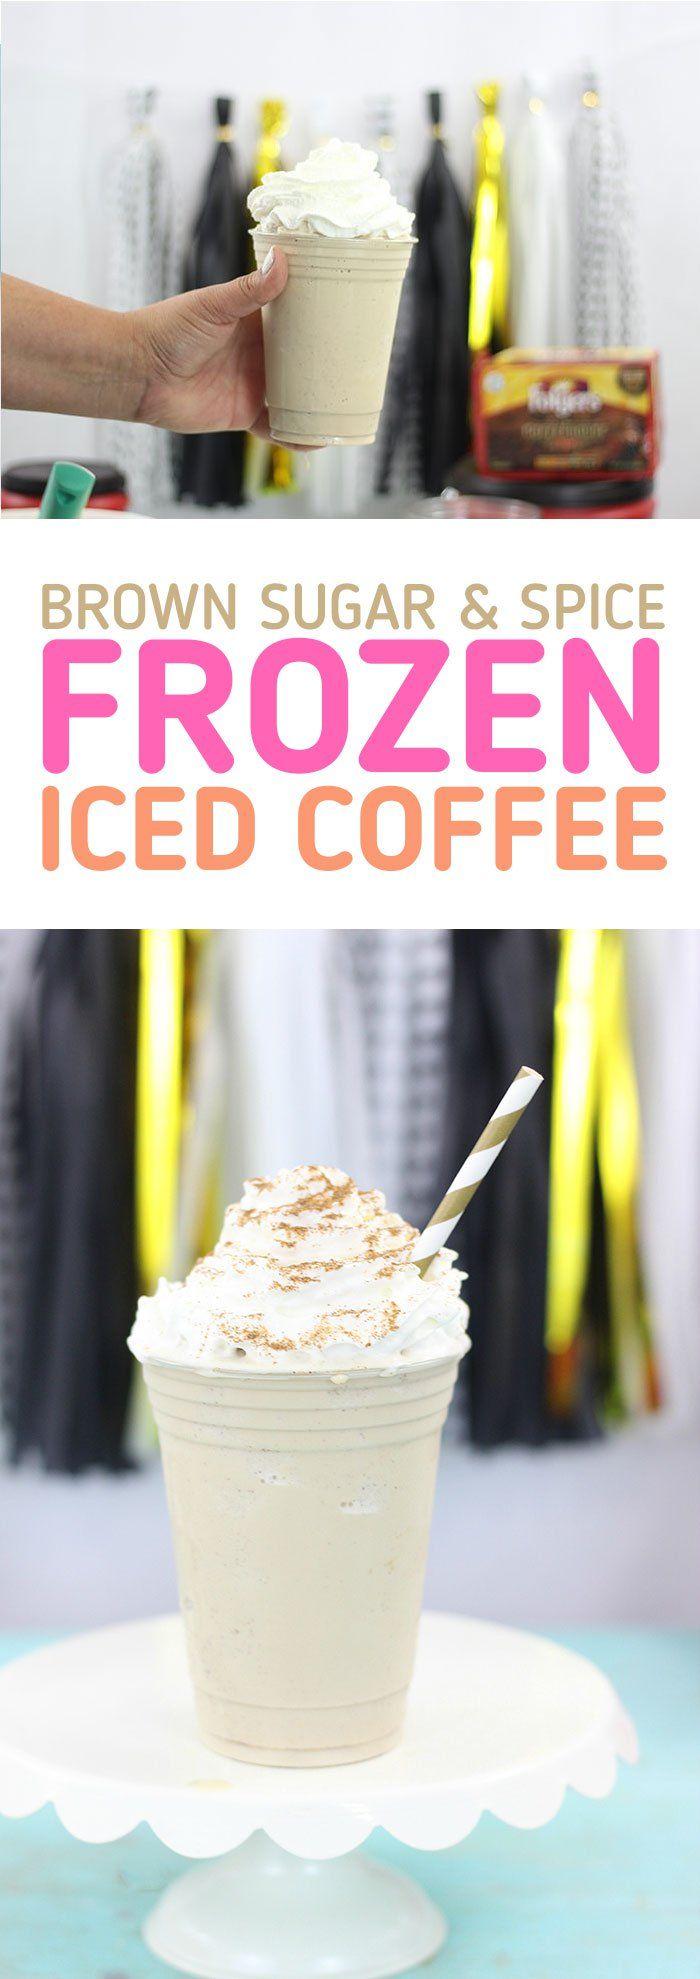 Brown Sugar & Spice Blended Coffee Recipe Coffee